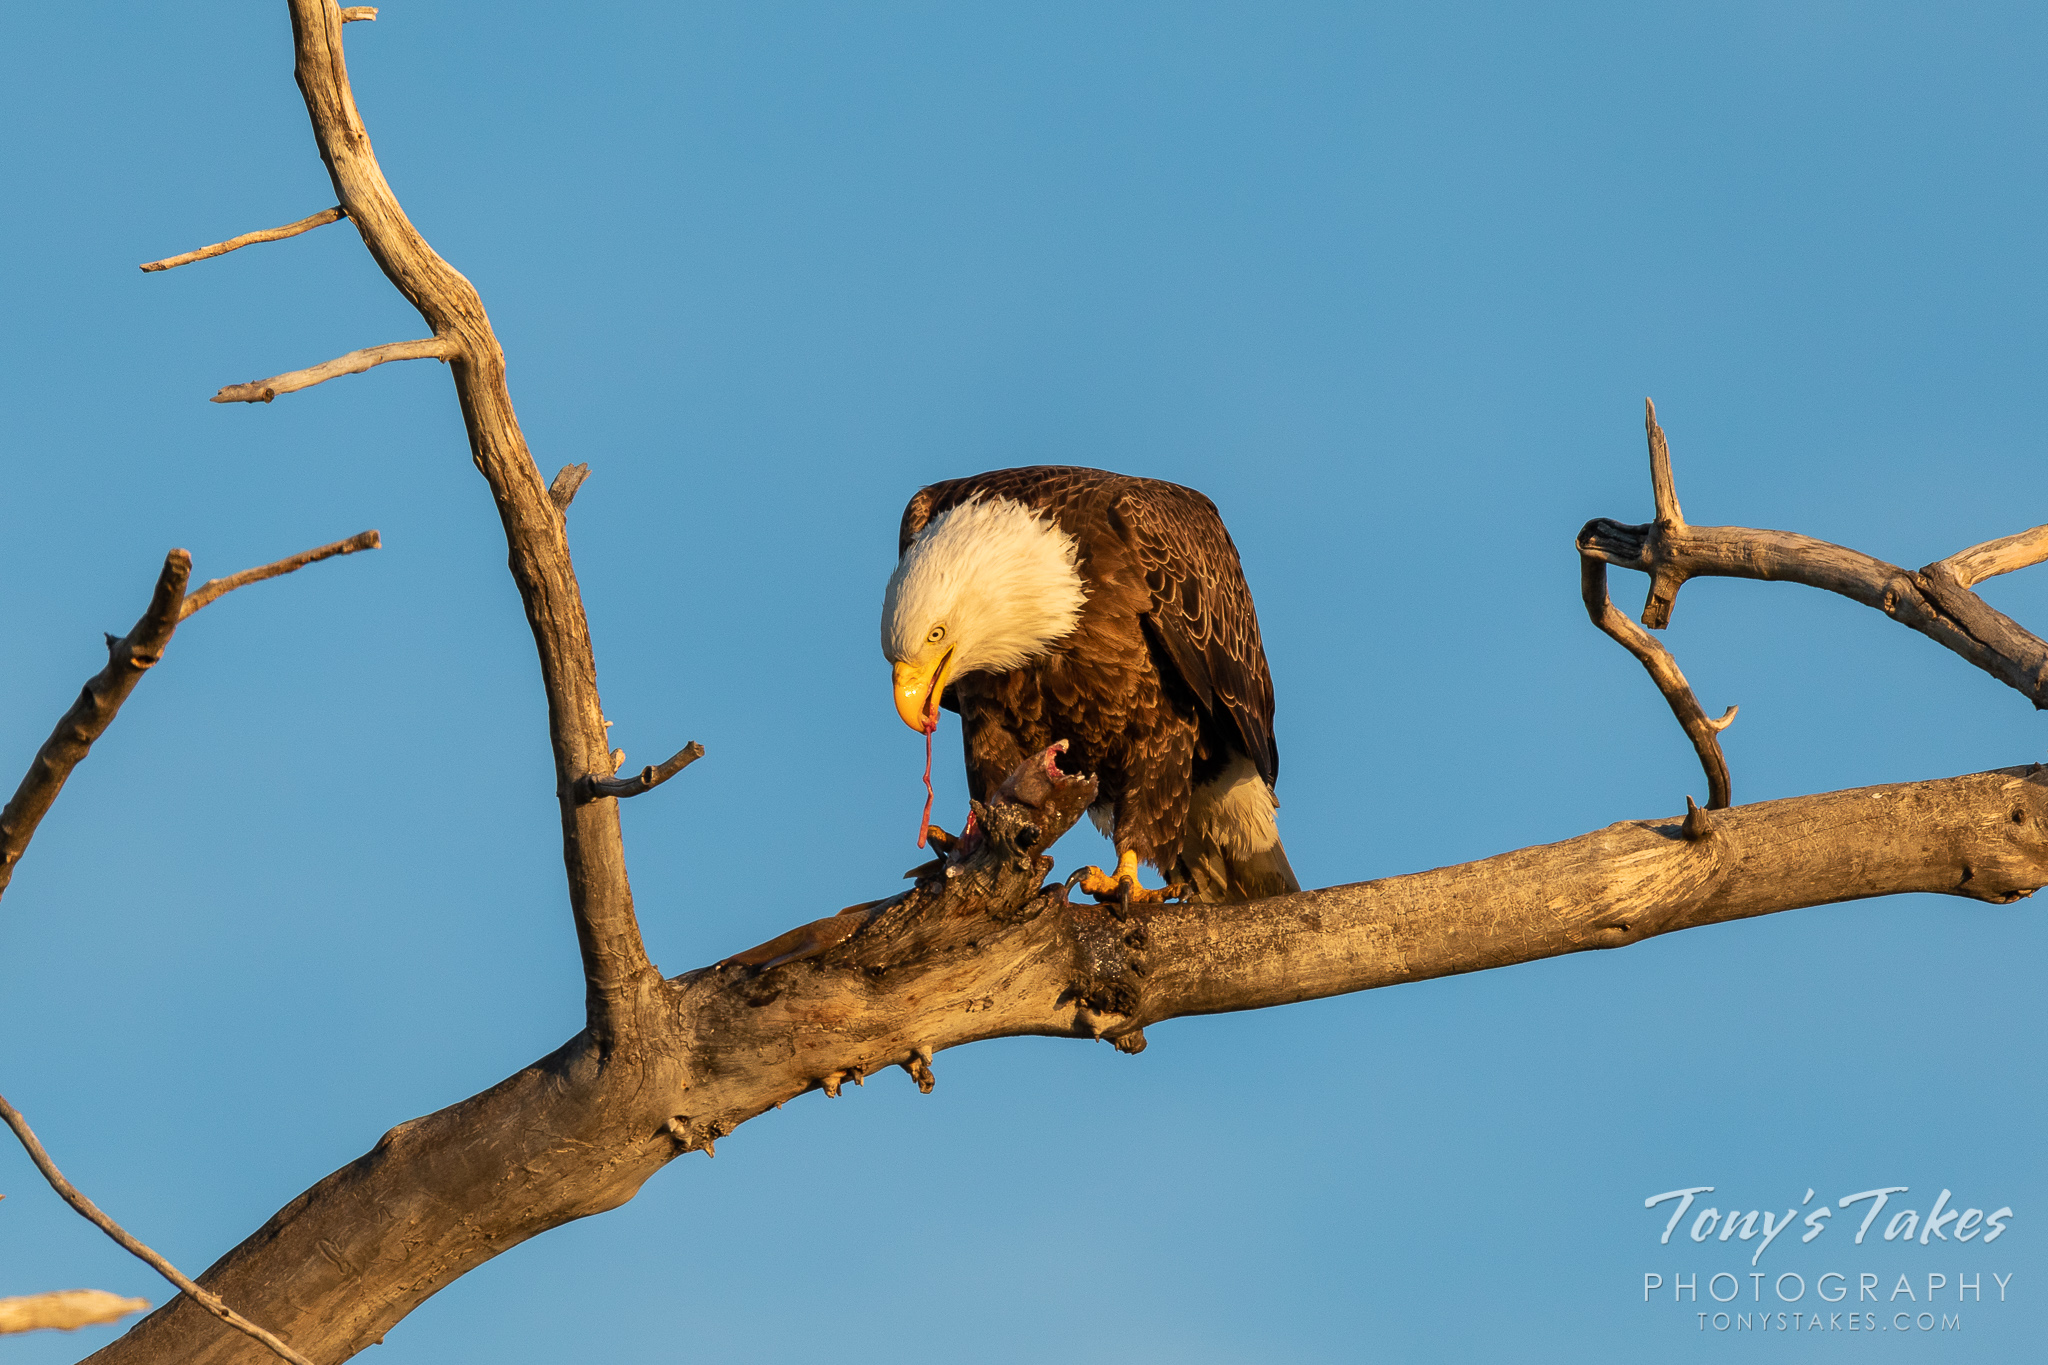 A bald eagle dines on fresh carp. (© Tony's Takes)